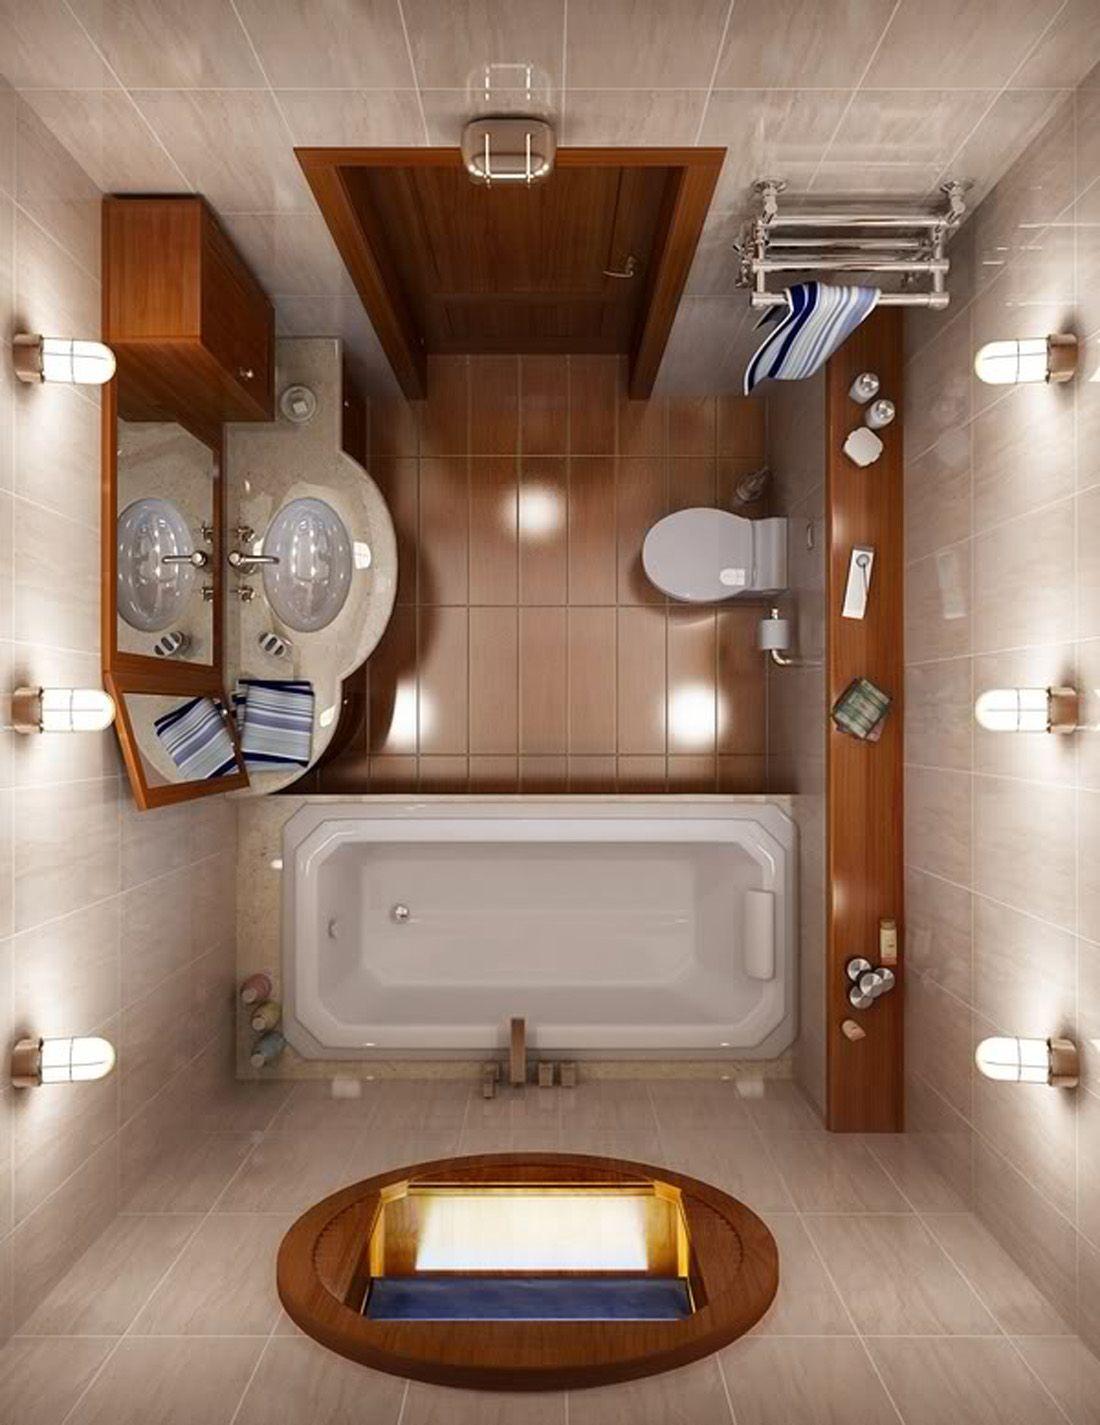 25 Bathroom Ideas For Small Spaces S Izobrazheniyami Dizajn